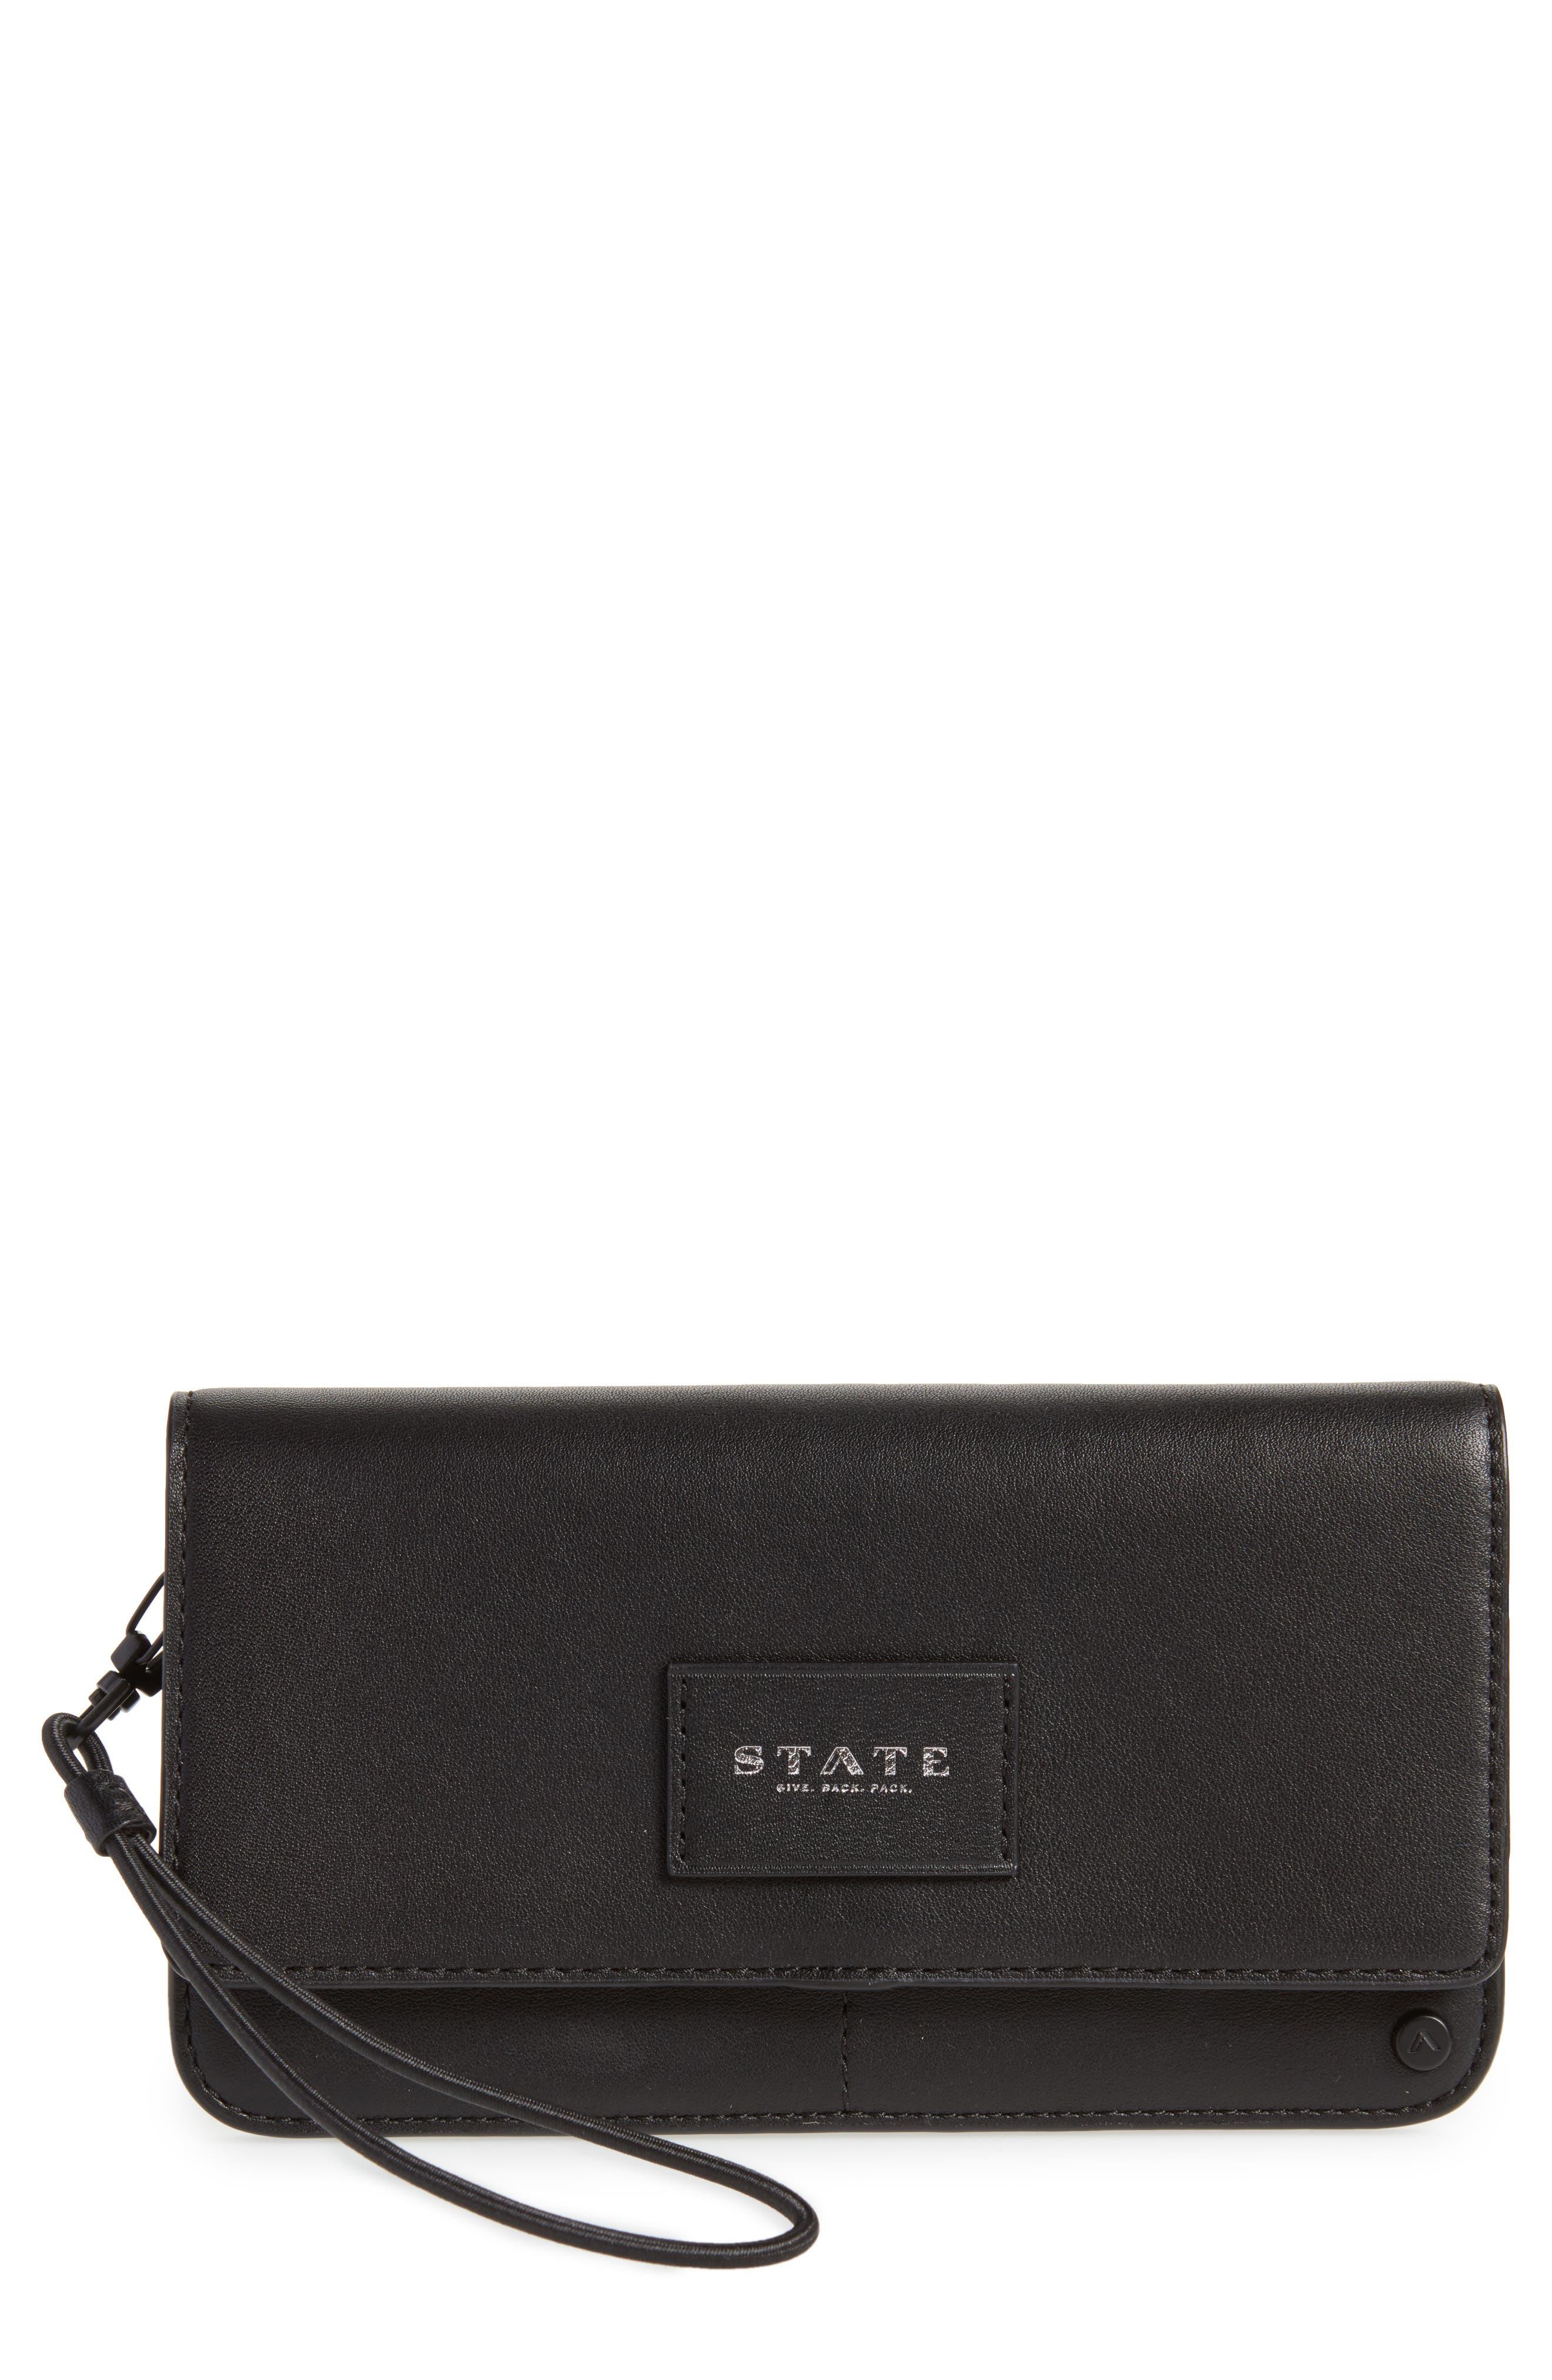 STATE Bags Parkville Bristol Leather Wristlet